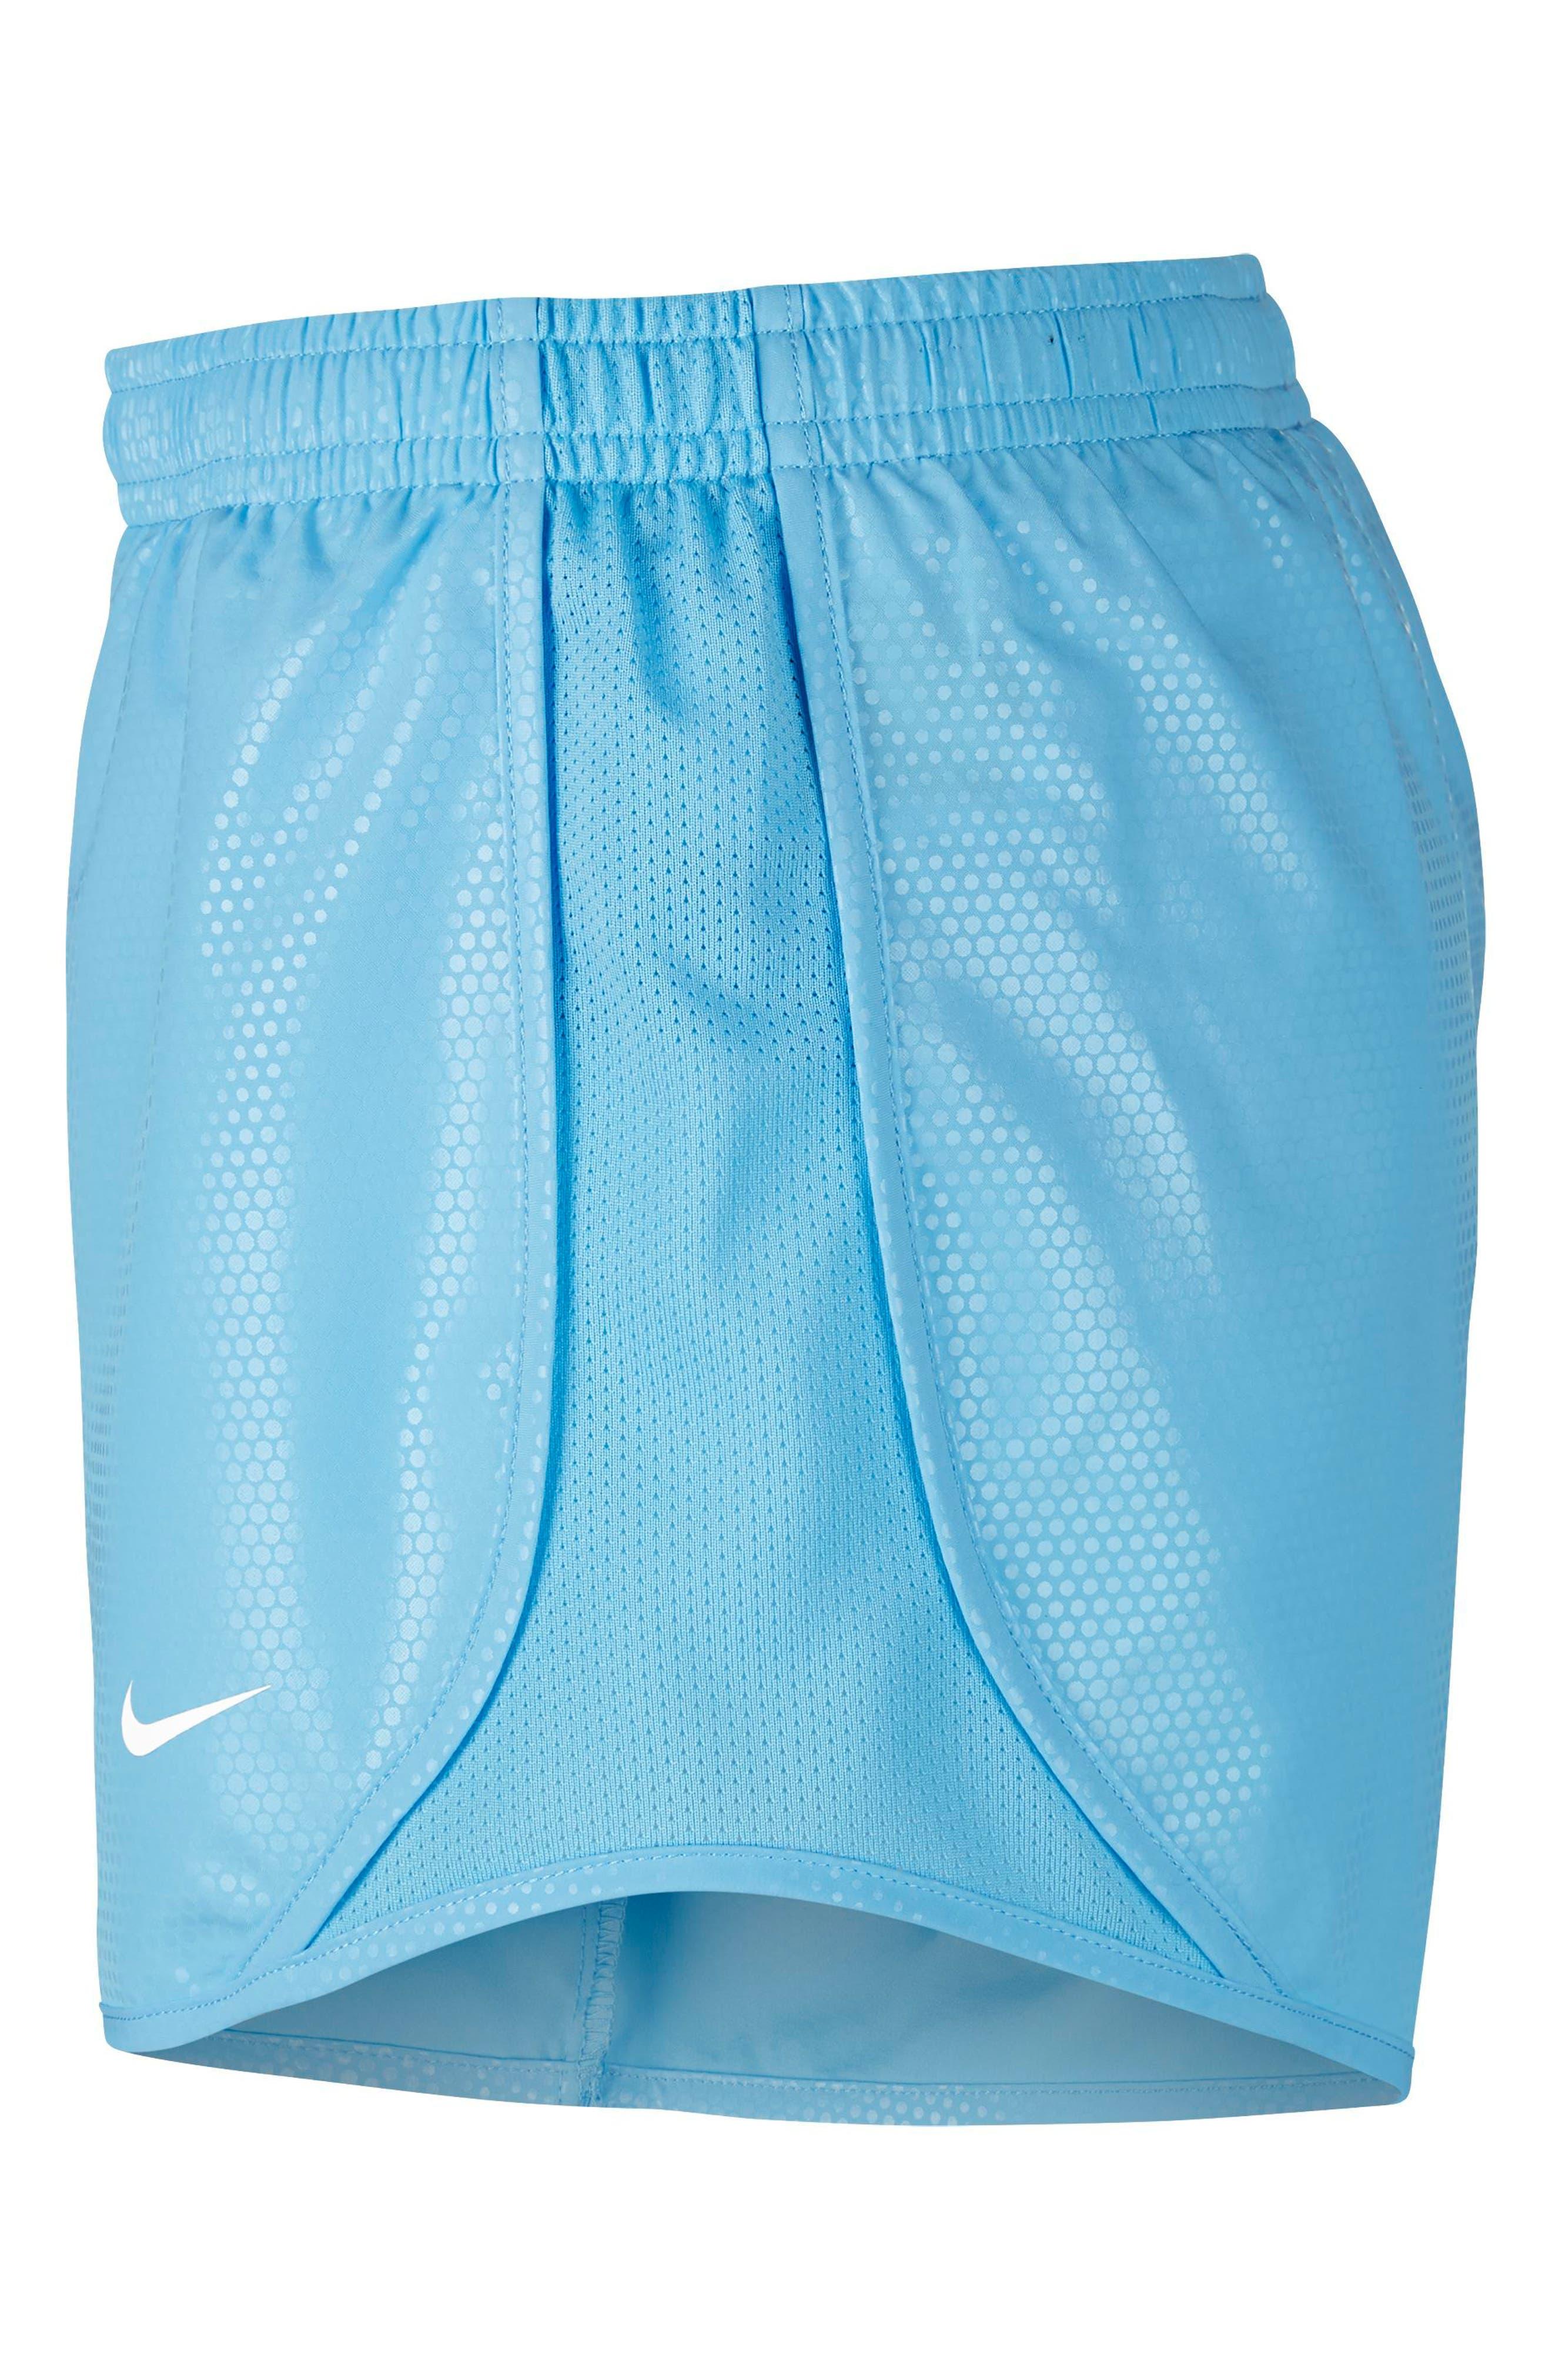 Dry Tempo Shorts,                             Alternate thumbnail 3, color,                             Blue Chill/ White